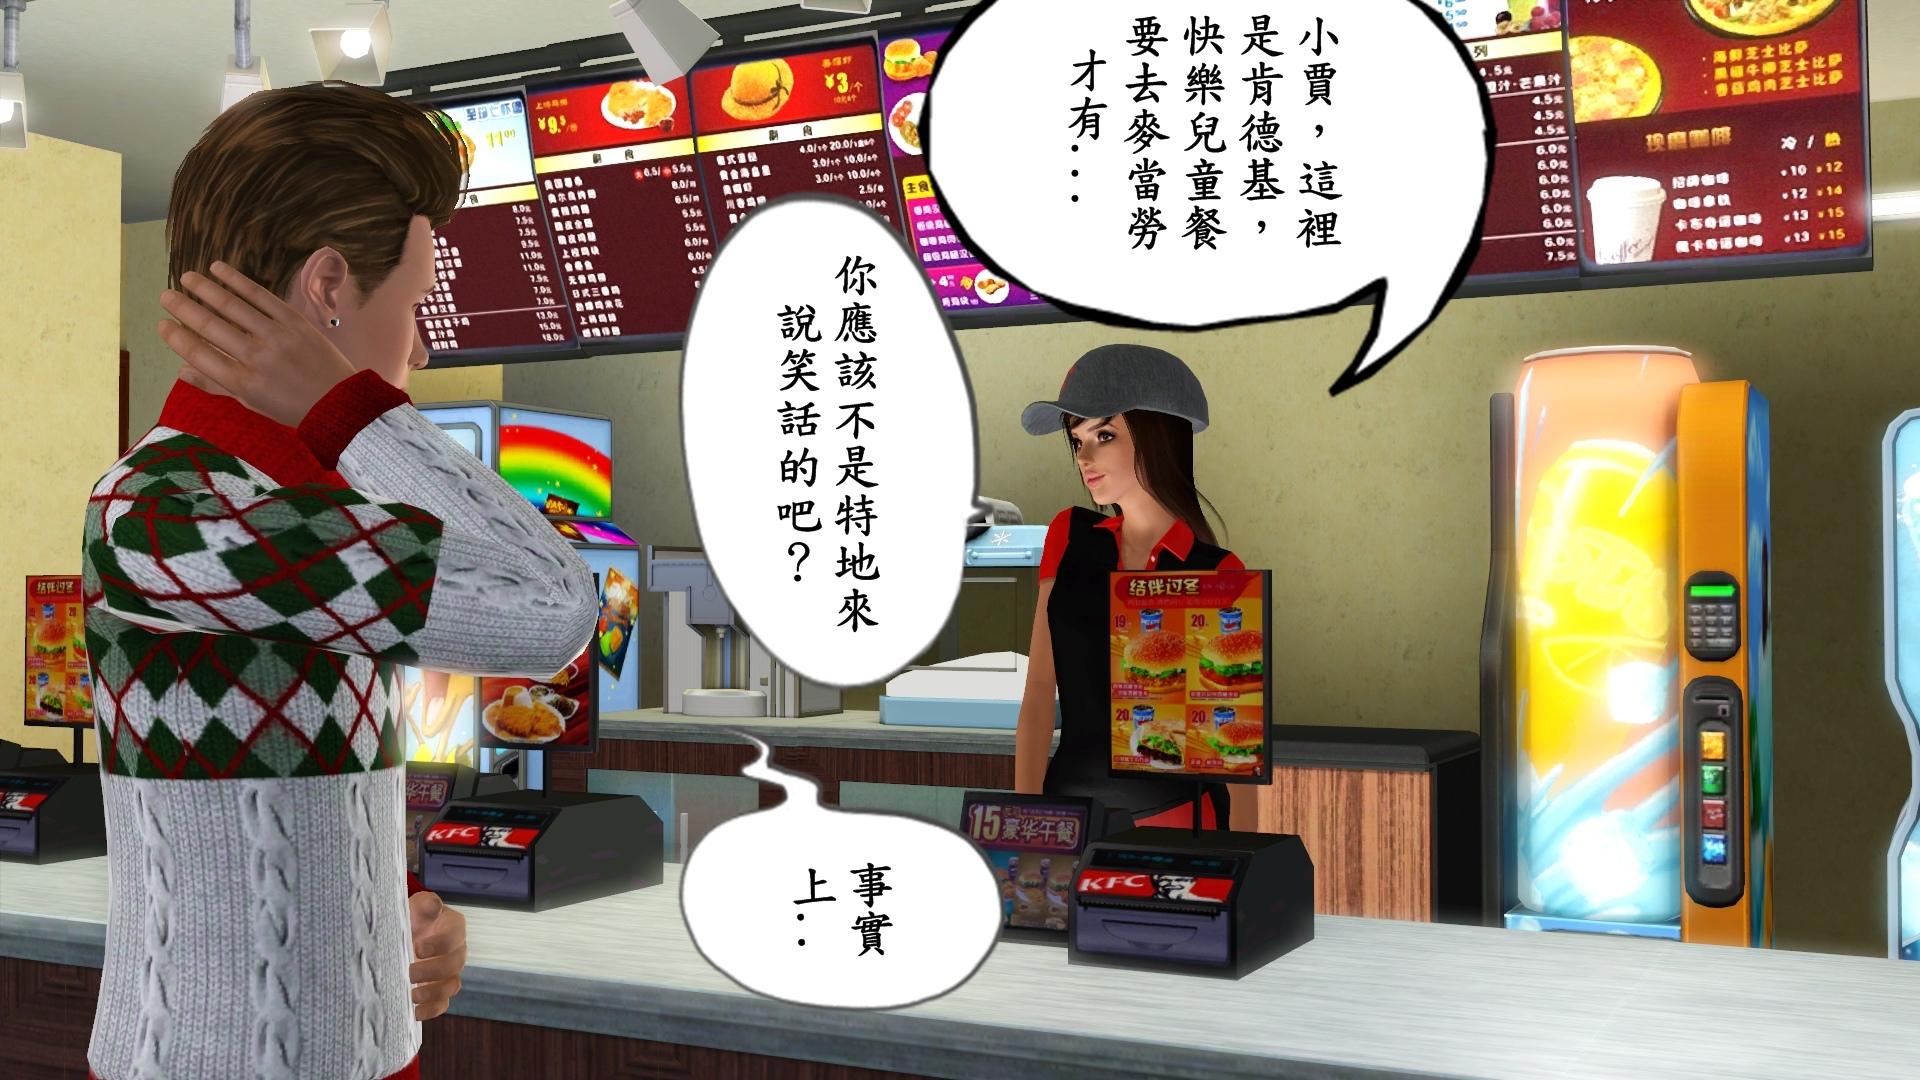 A07小賈,這裡是肯德基,快樂兒童餐要去麥當勞才有,你應該不是特地來說笑話的吧? 不...事實上....jpg